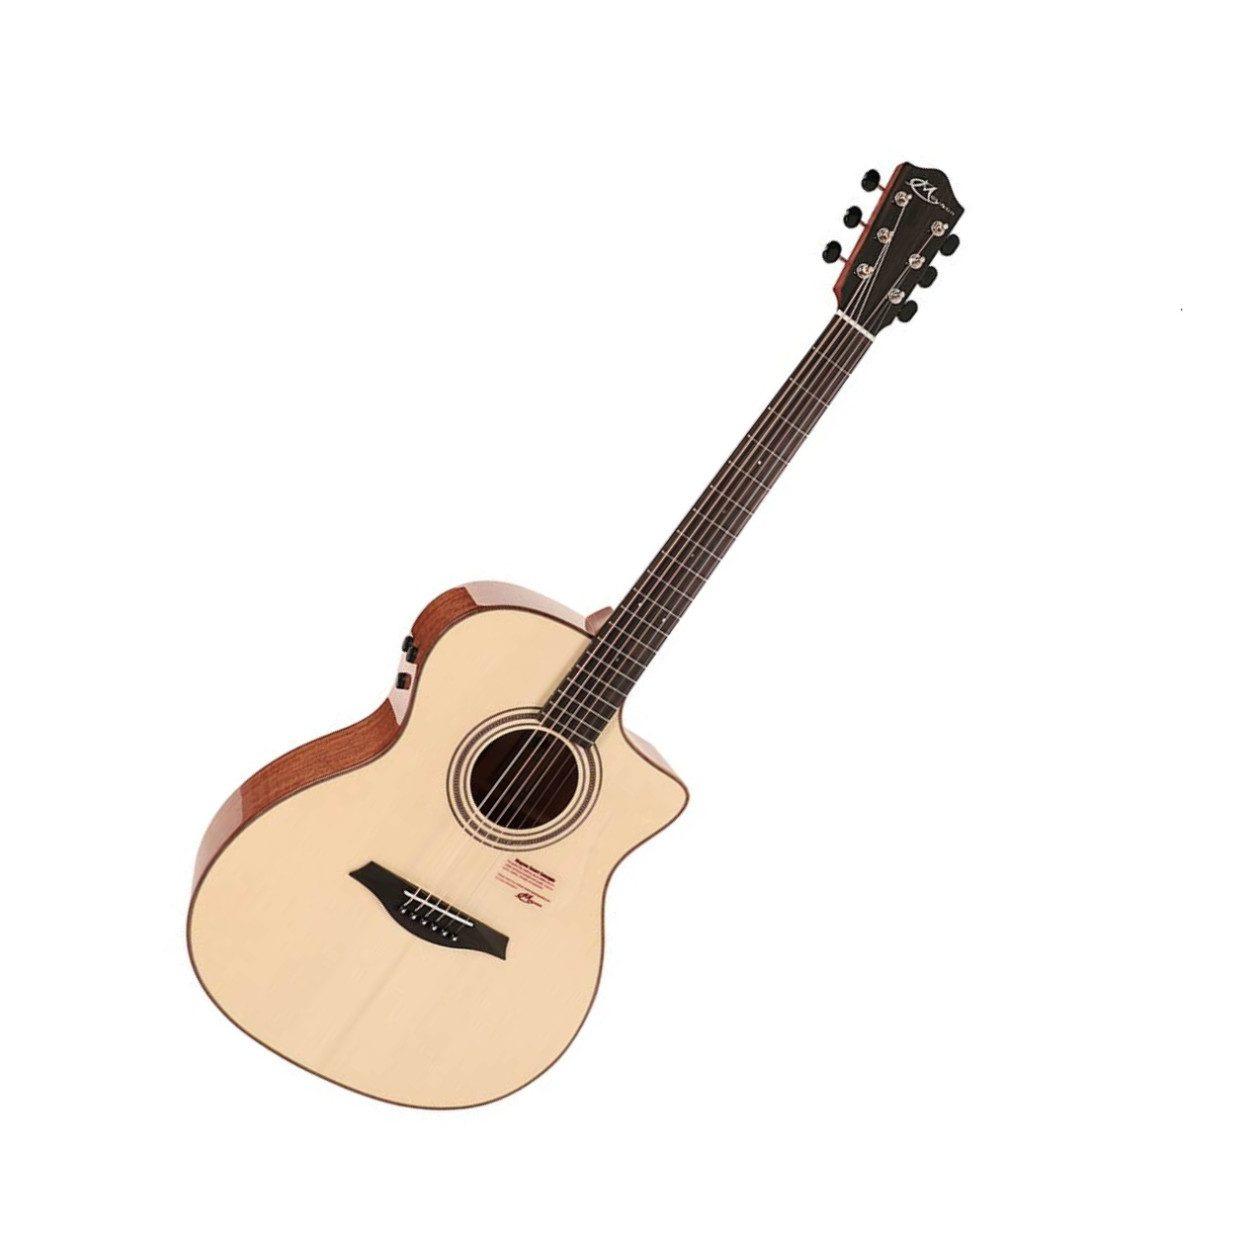 Mayson Vista Electro Acoustic Guitar available at Penarth Music Centre